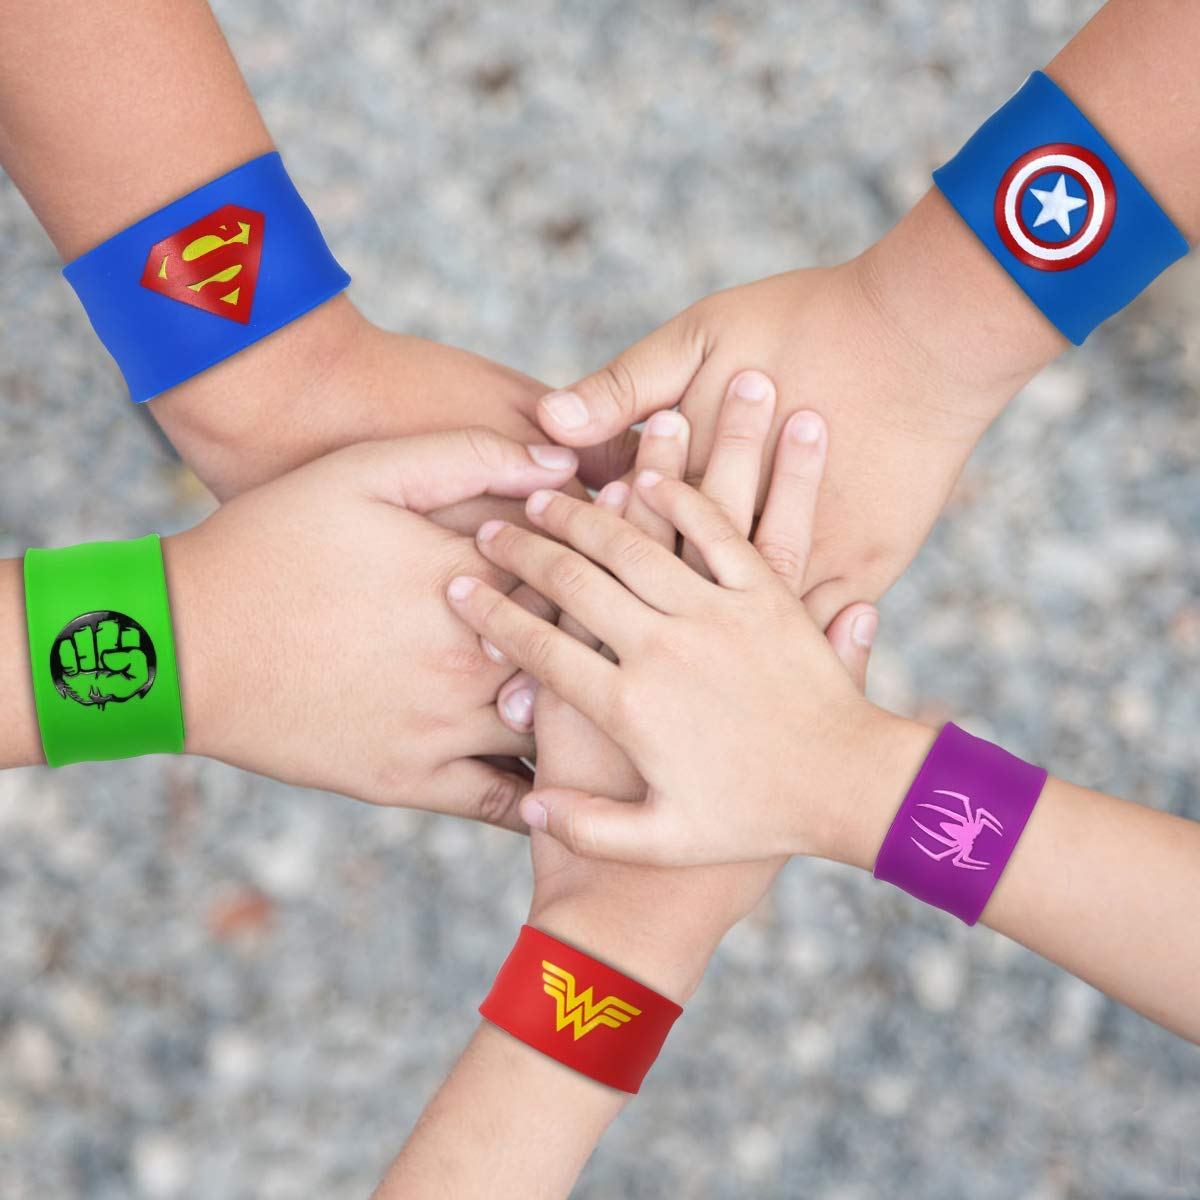 POKONBOY Superhero Slap Bracelets for Kids Party favors - 24 Pack Slap Bracelets for Boys Girls Kids Super Hero Birthday Party Favors Supplies Carnival Boys Prizes by POKONBOY (Image #8)